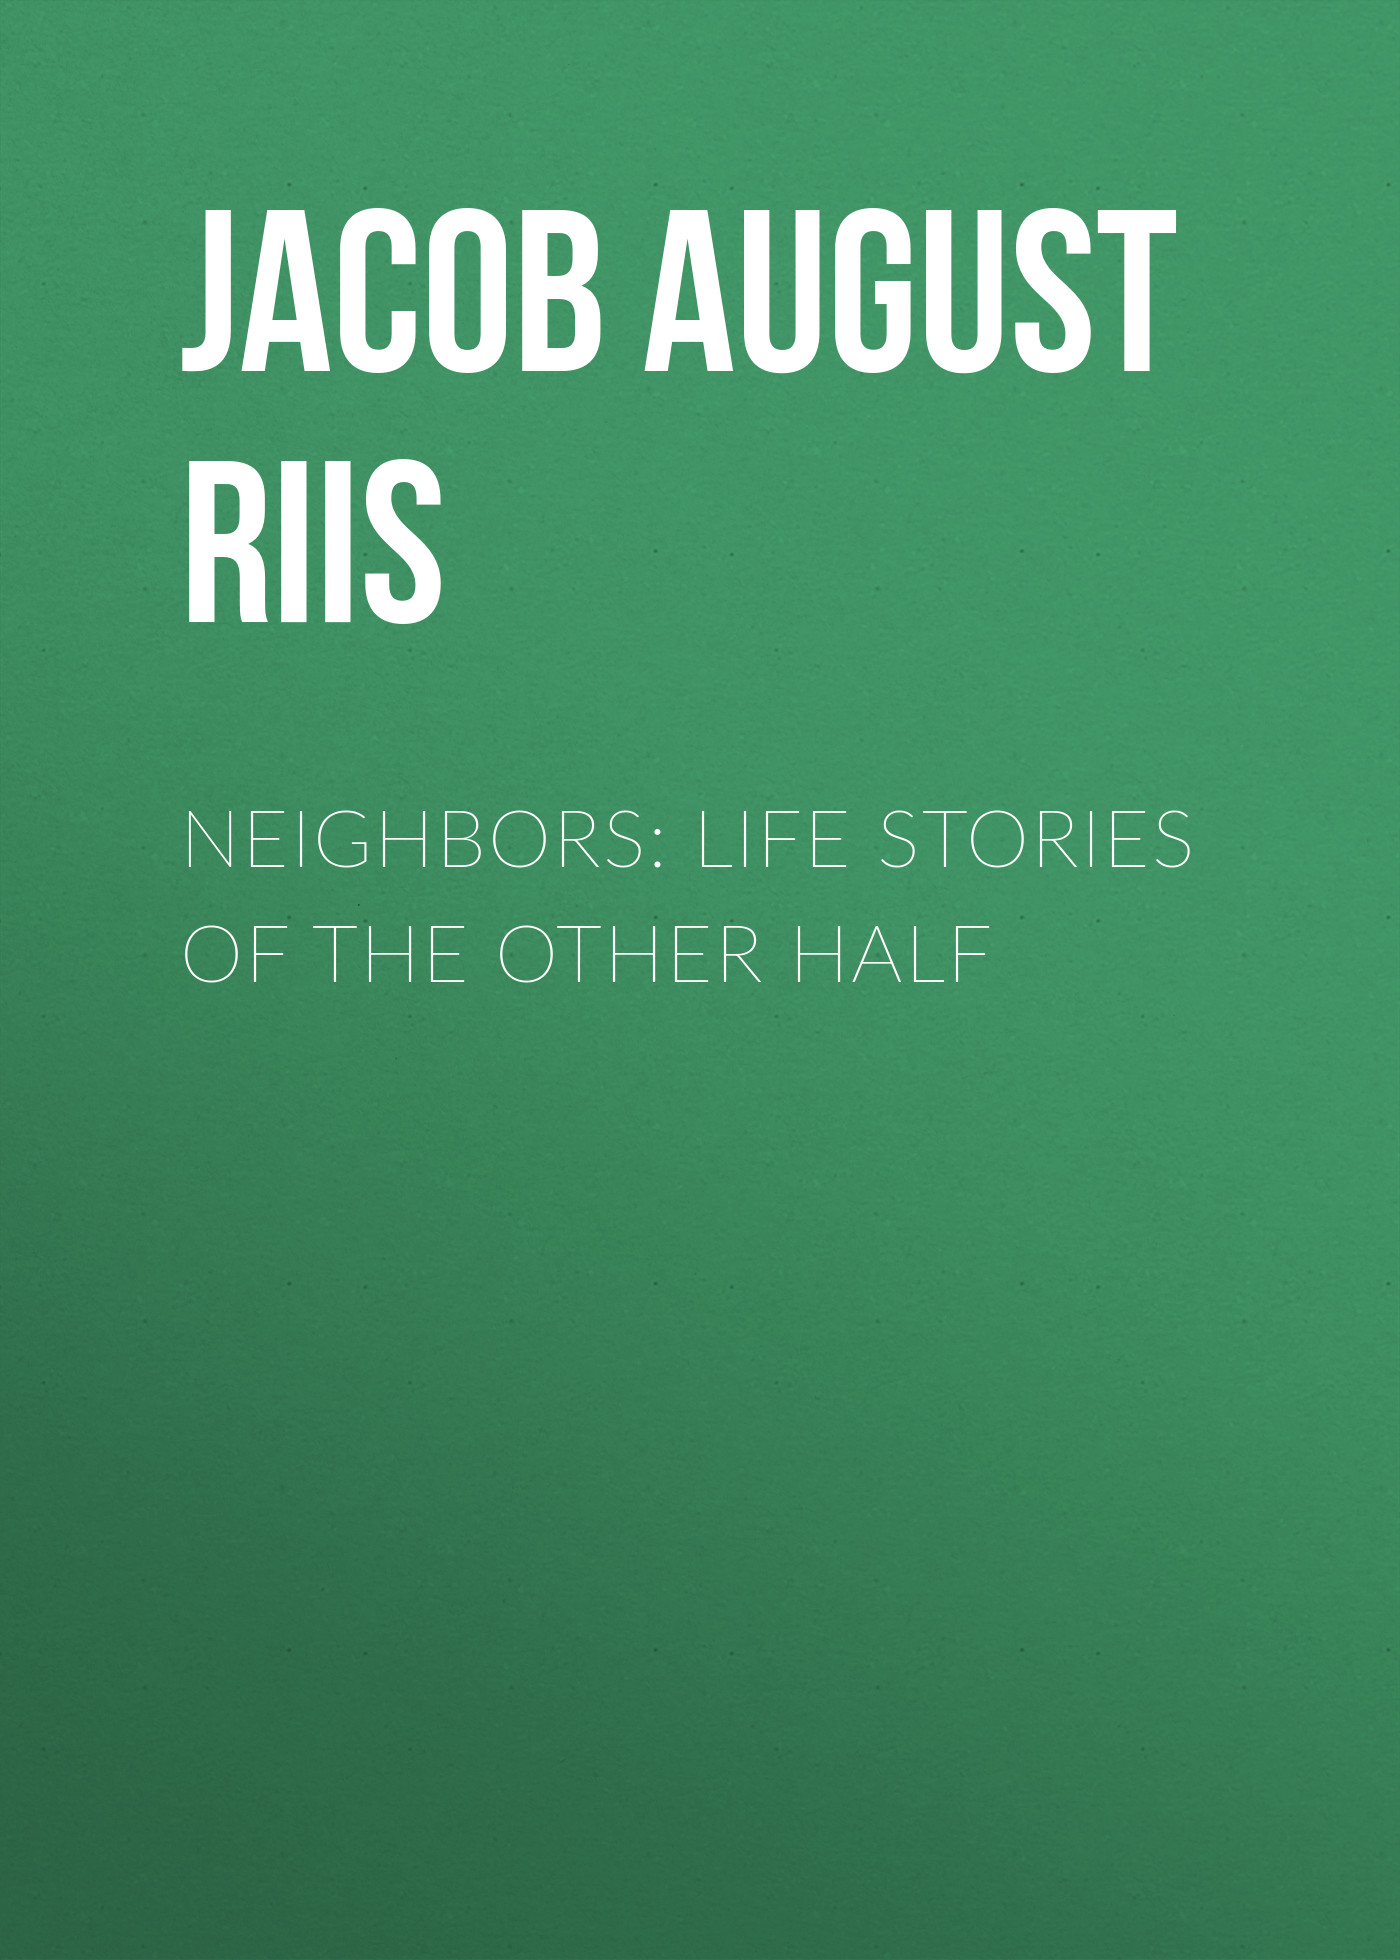 все цены на Jacob August Riis Neighbors: Life Stories of the Other Half